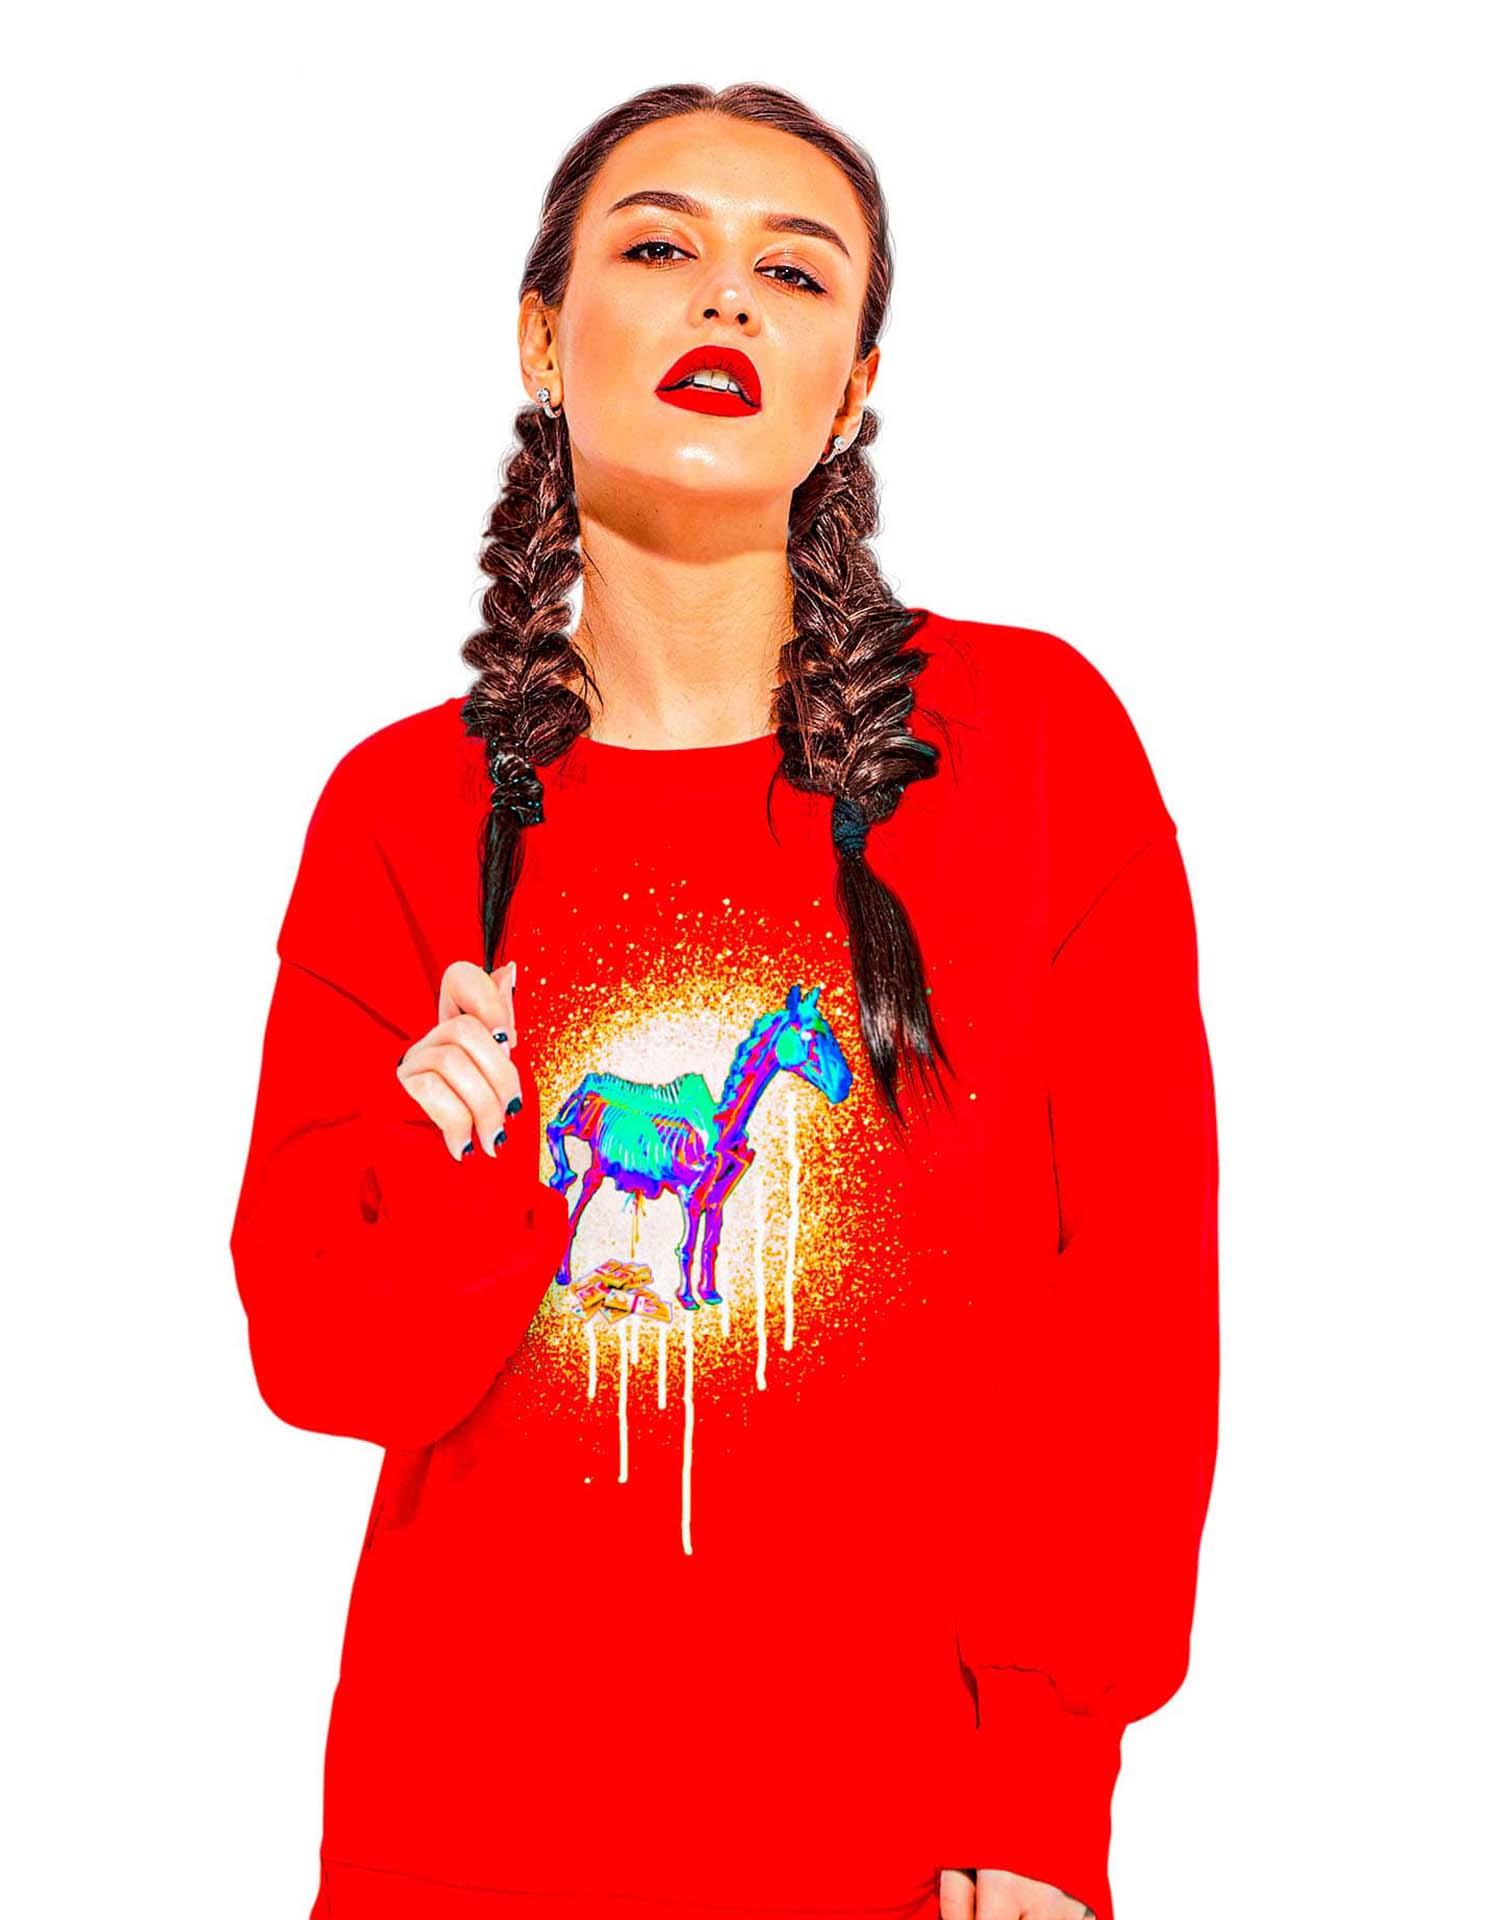 Woman in red sweatshirt wearing Satin.